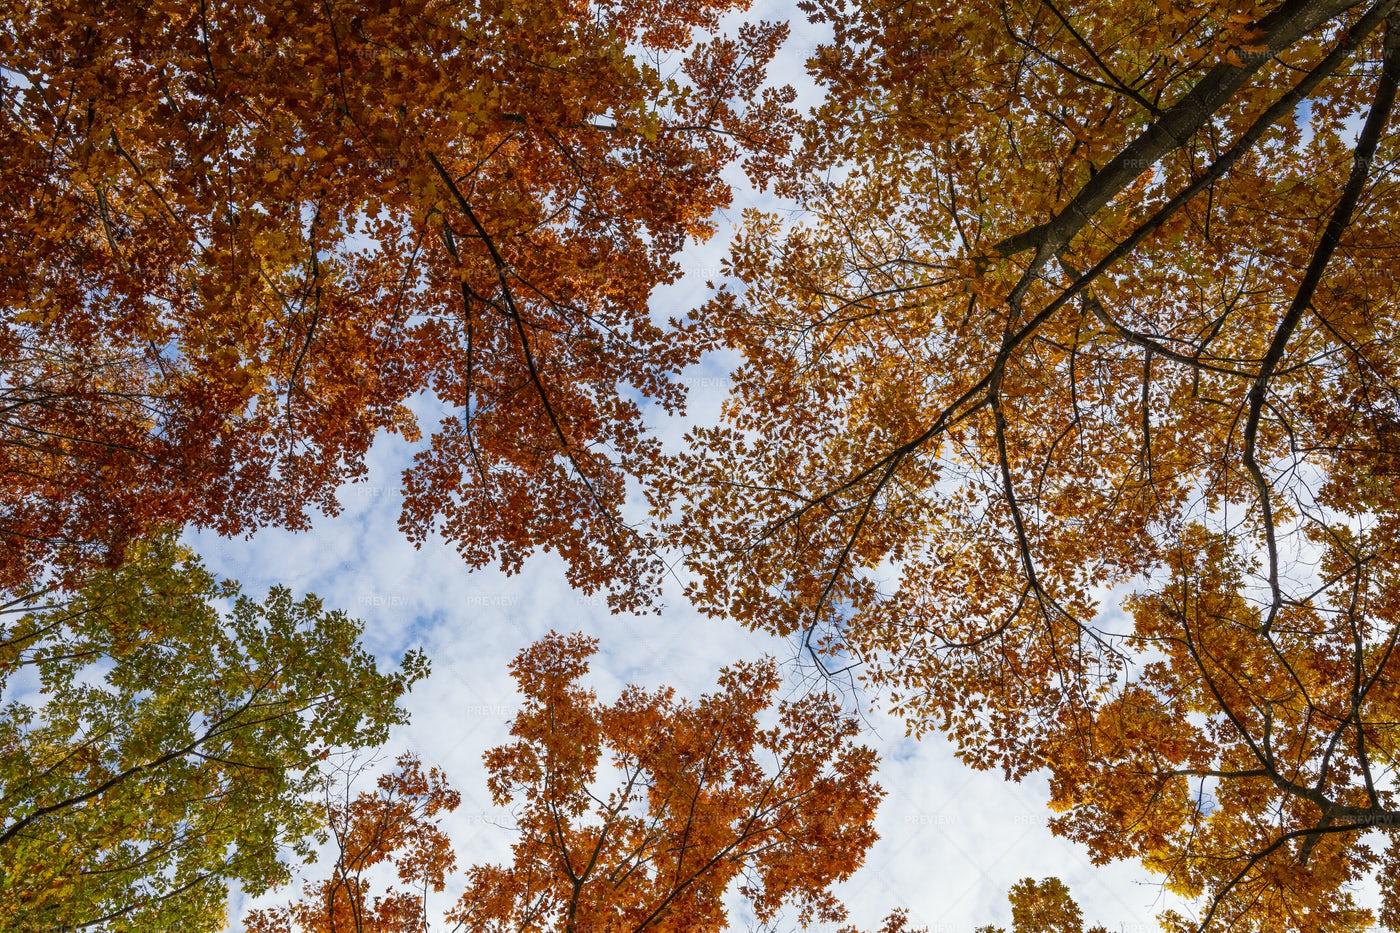 Autumn Trees Perspective: Stock Photos